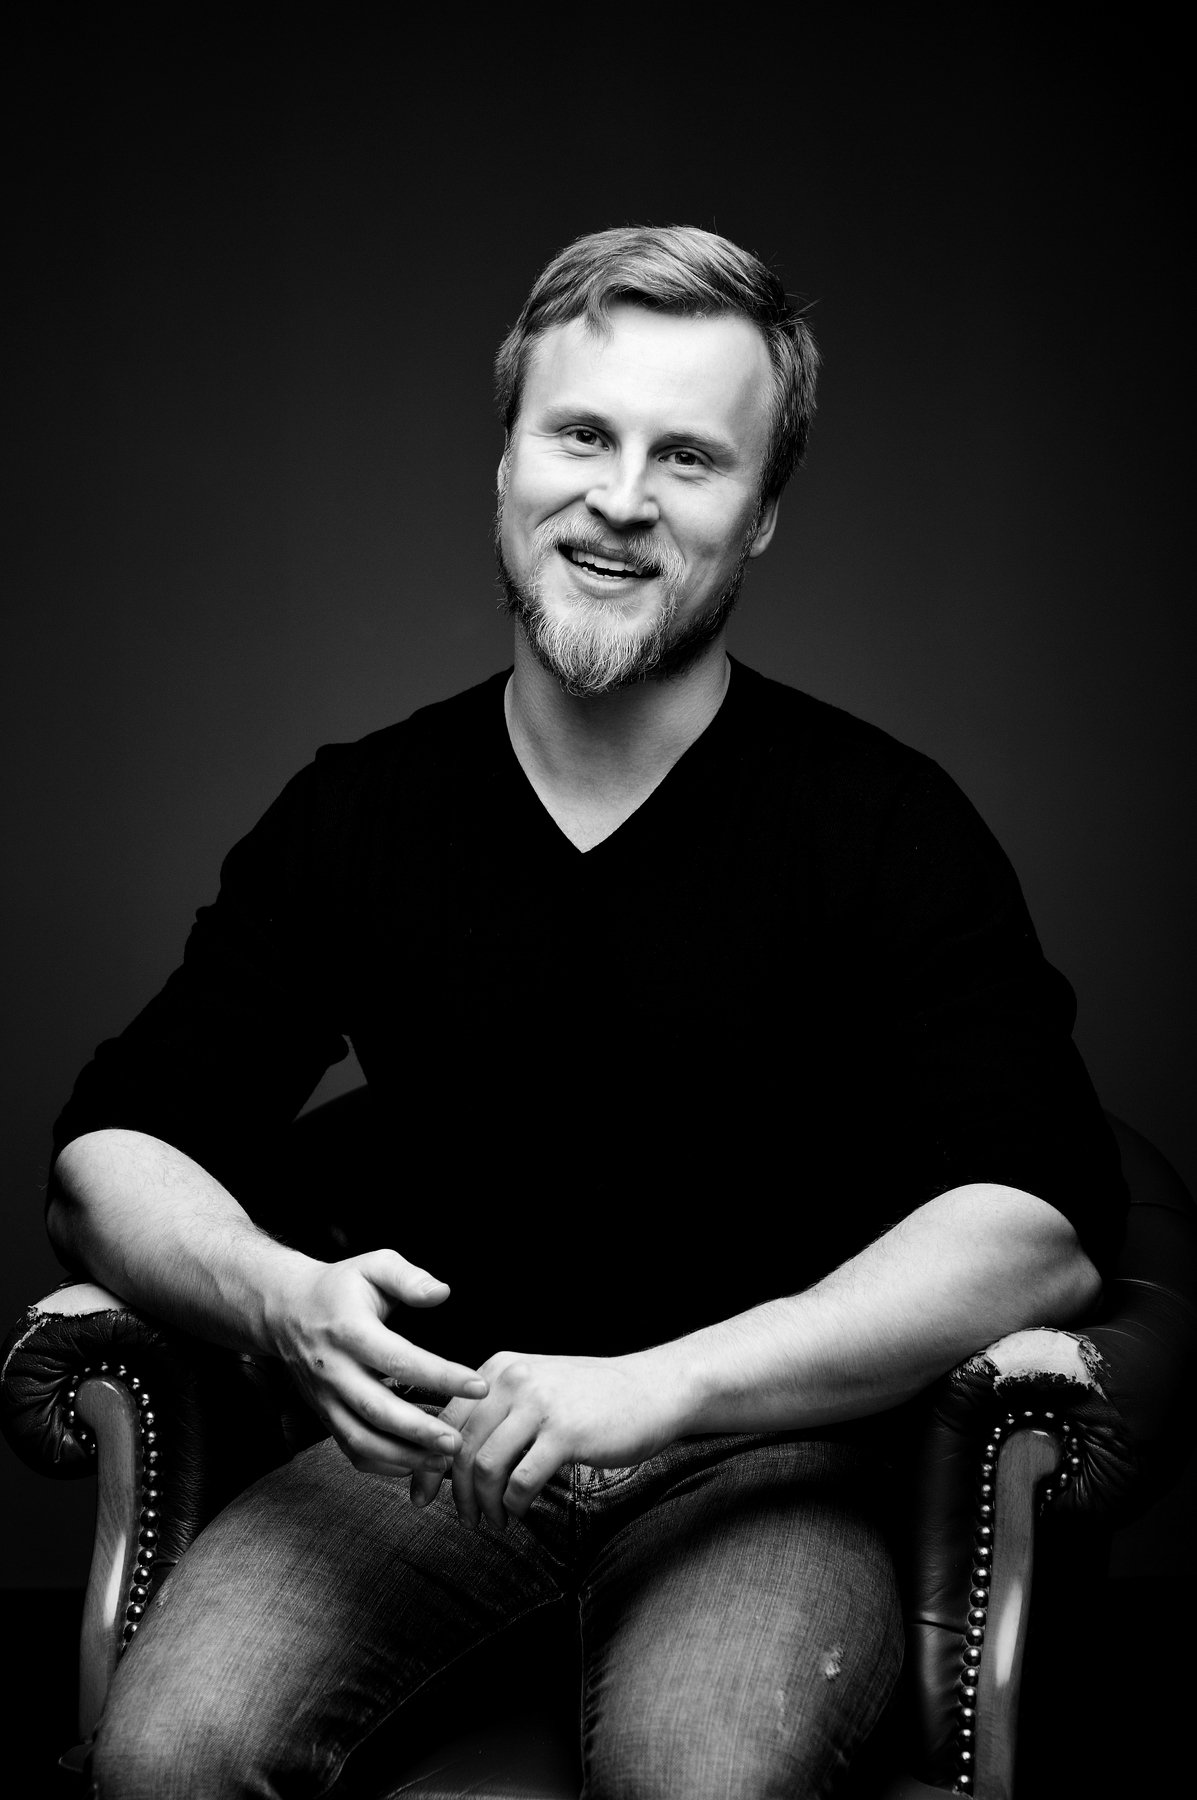 мужской портрет,студия,person, Влад Шуман